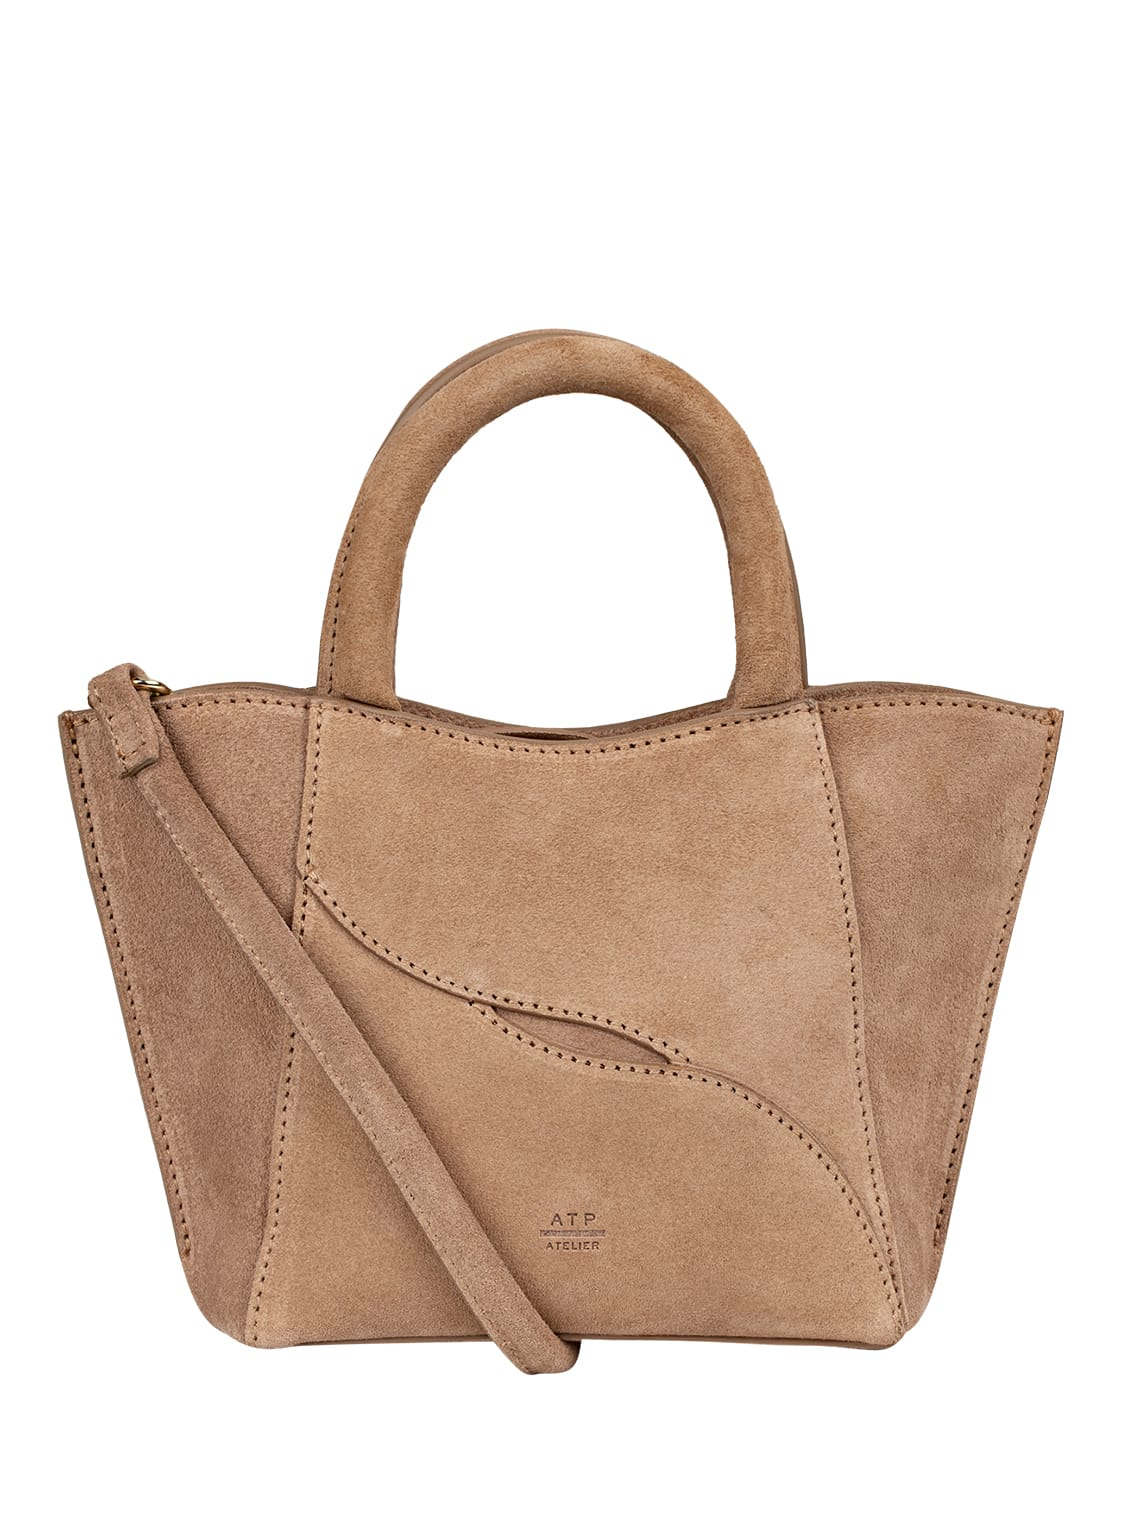 Image of Atp Atelier Micro-Bag Leuca beige